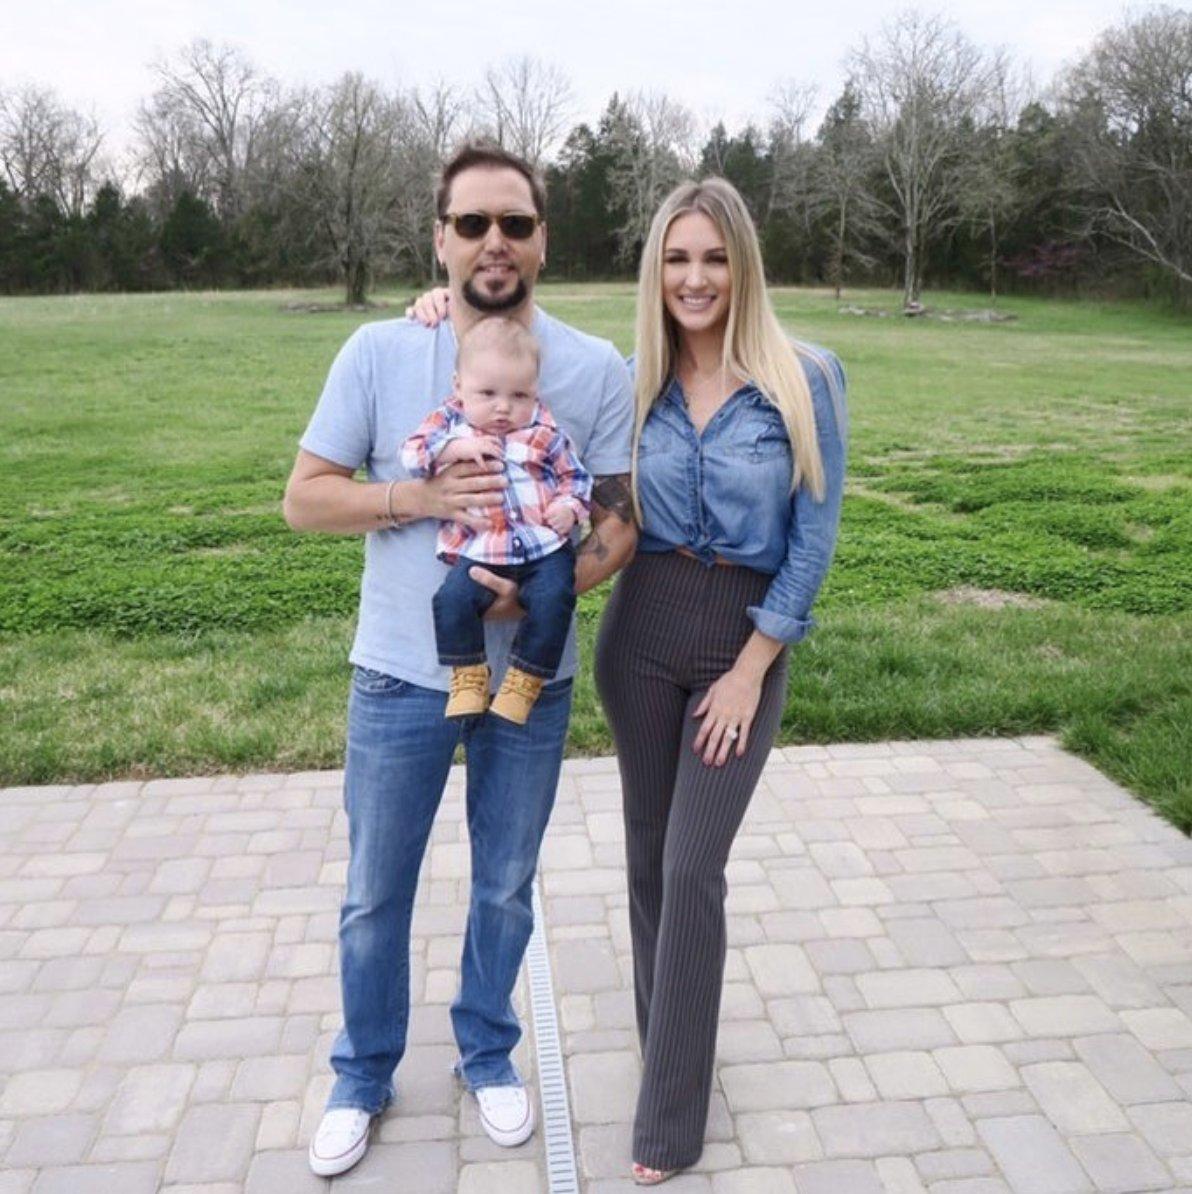 Rearview Town Jason Aldean: Miranda Lambert Nixed Jason Aldean's First 'Rearview Town